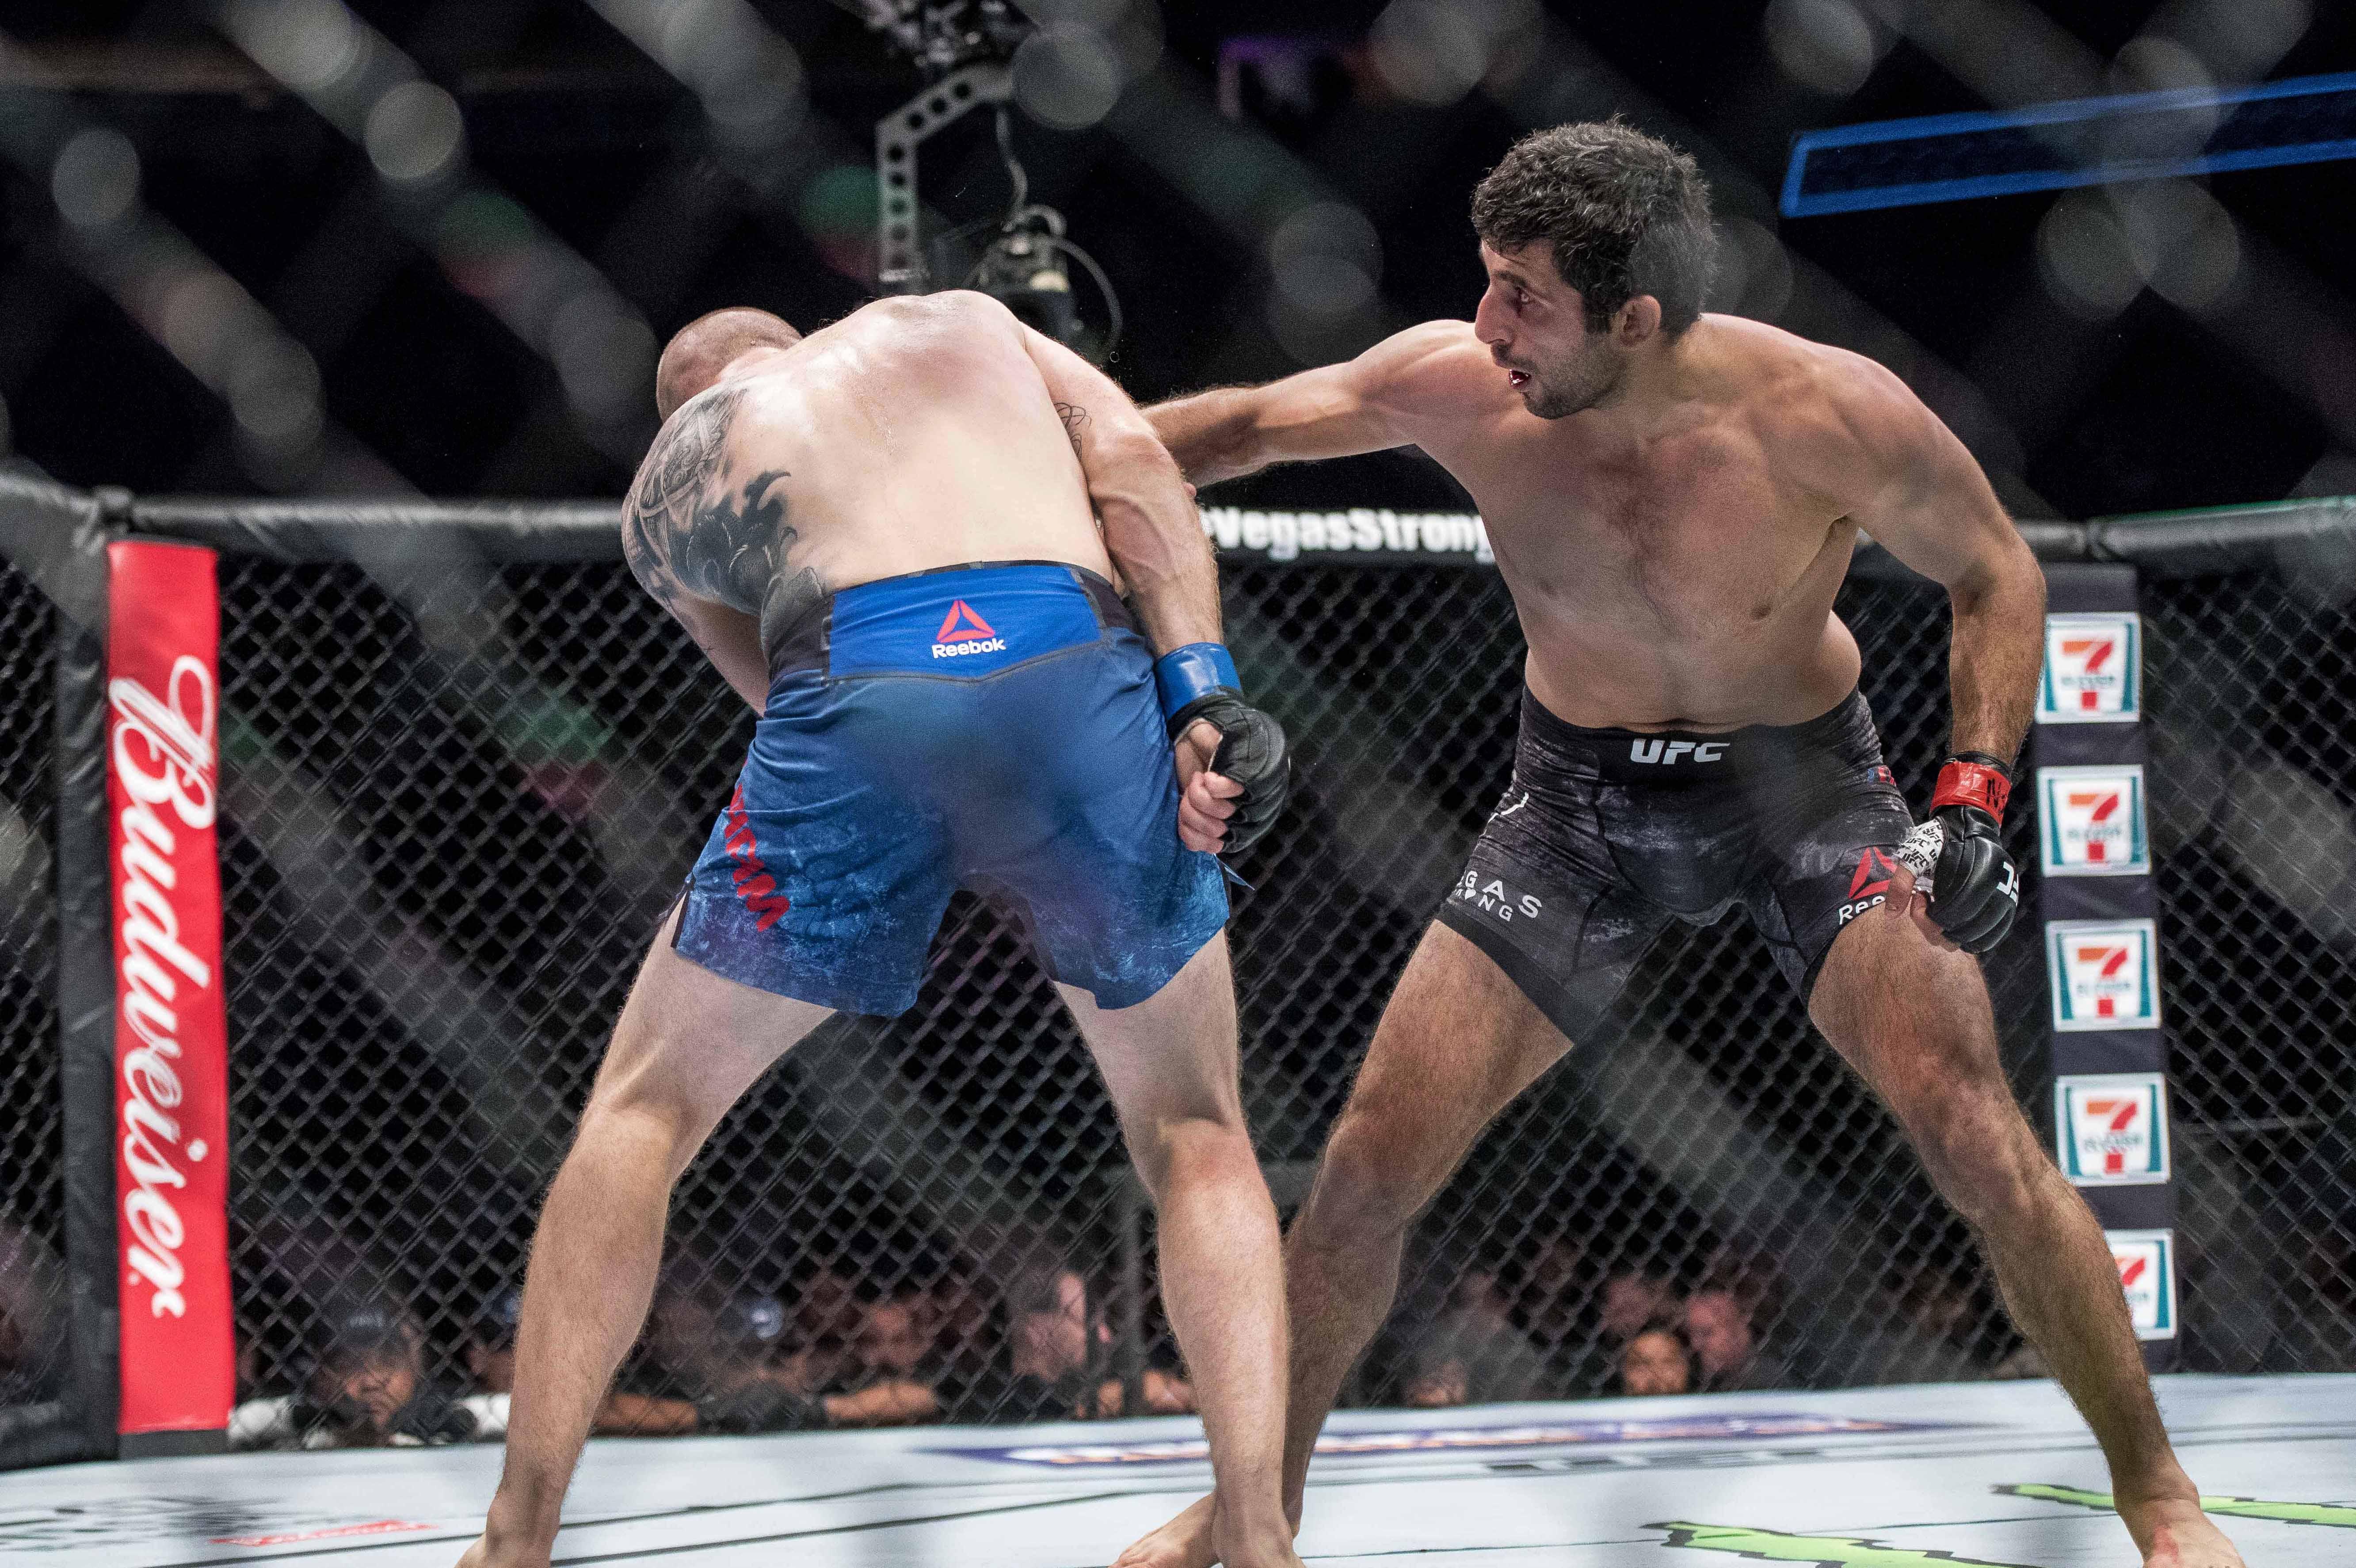 MMA: UFC 216-Dariush vs Dunham